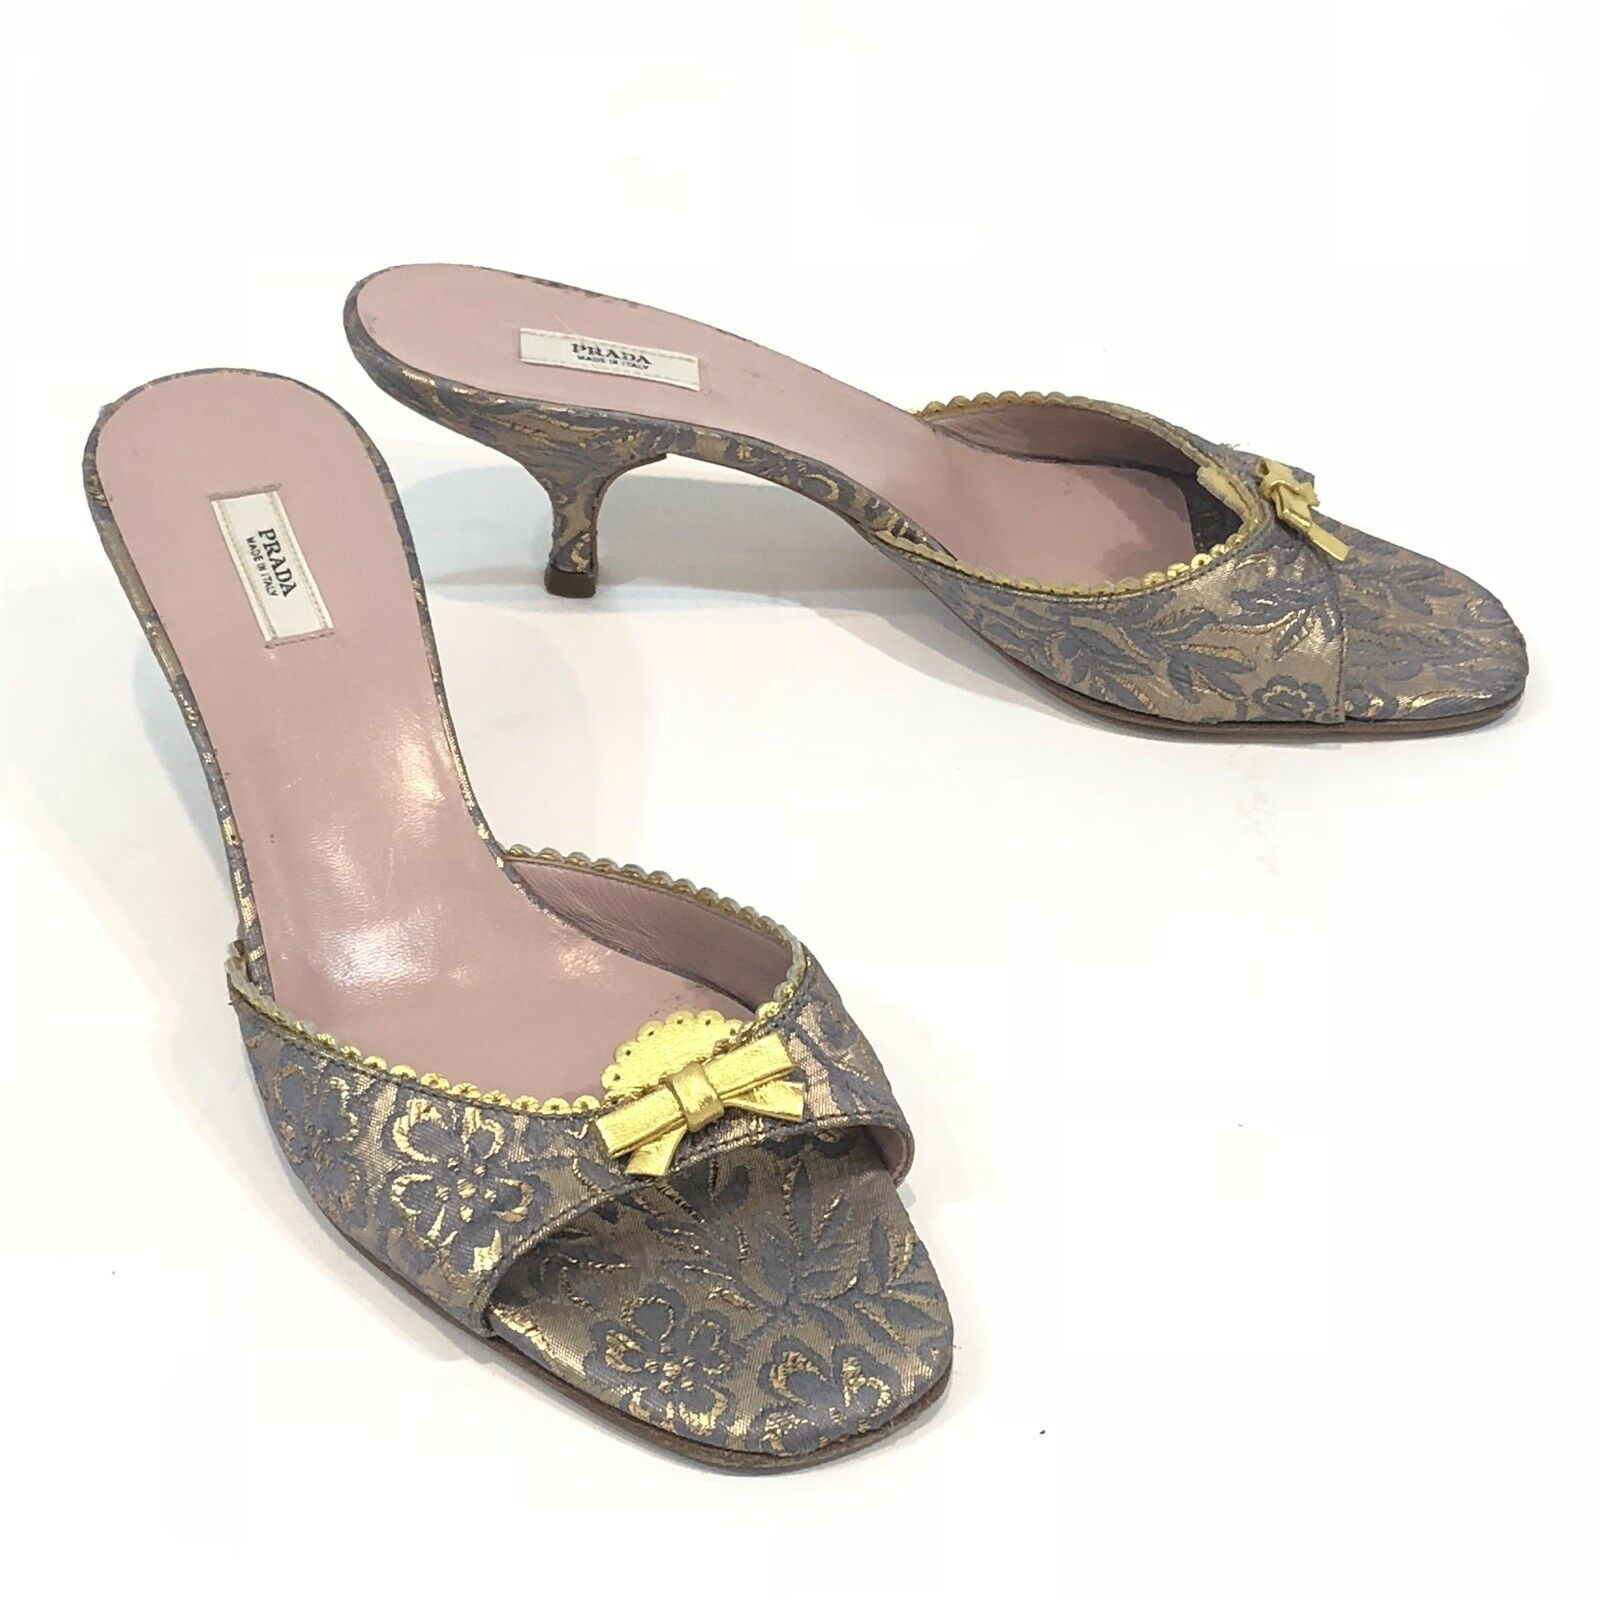 Vintage  PRADA kitten heels Mules Slip On size 35.5 Open Toe